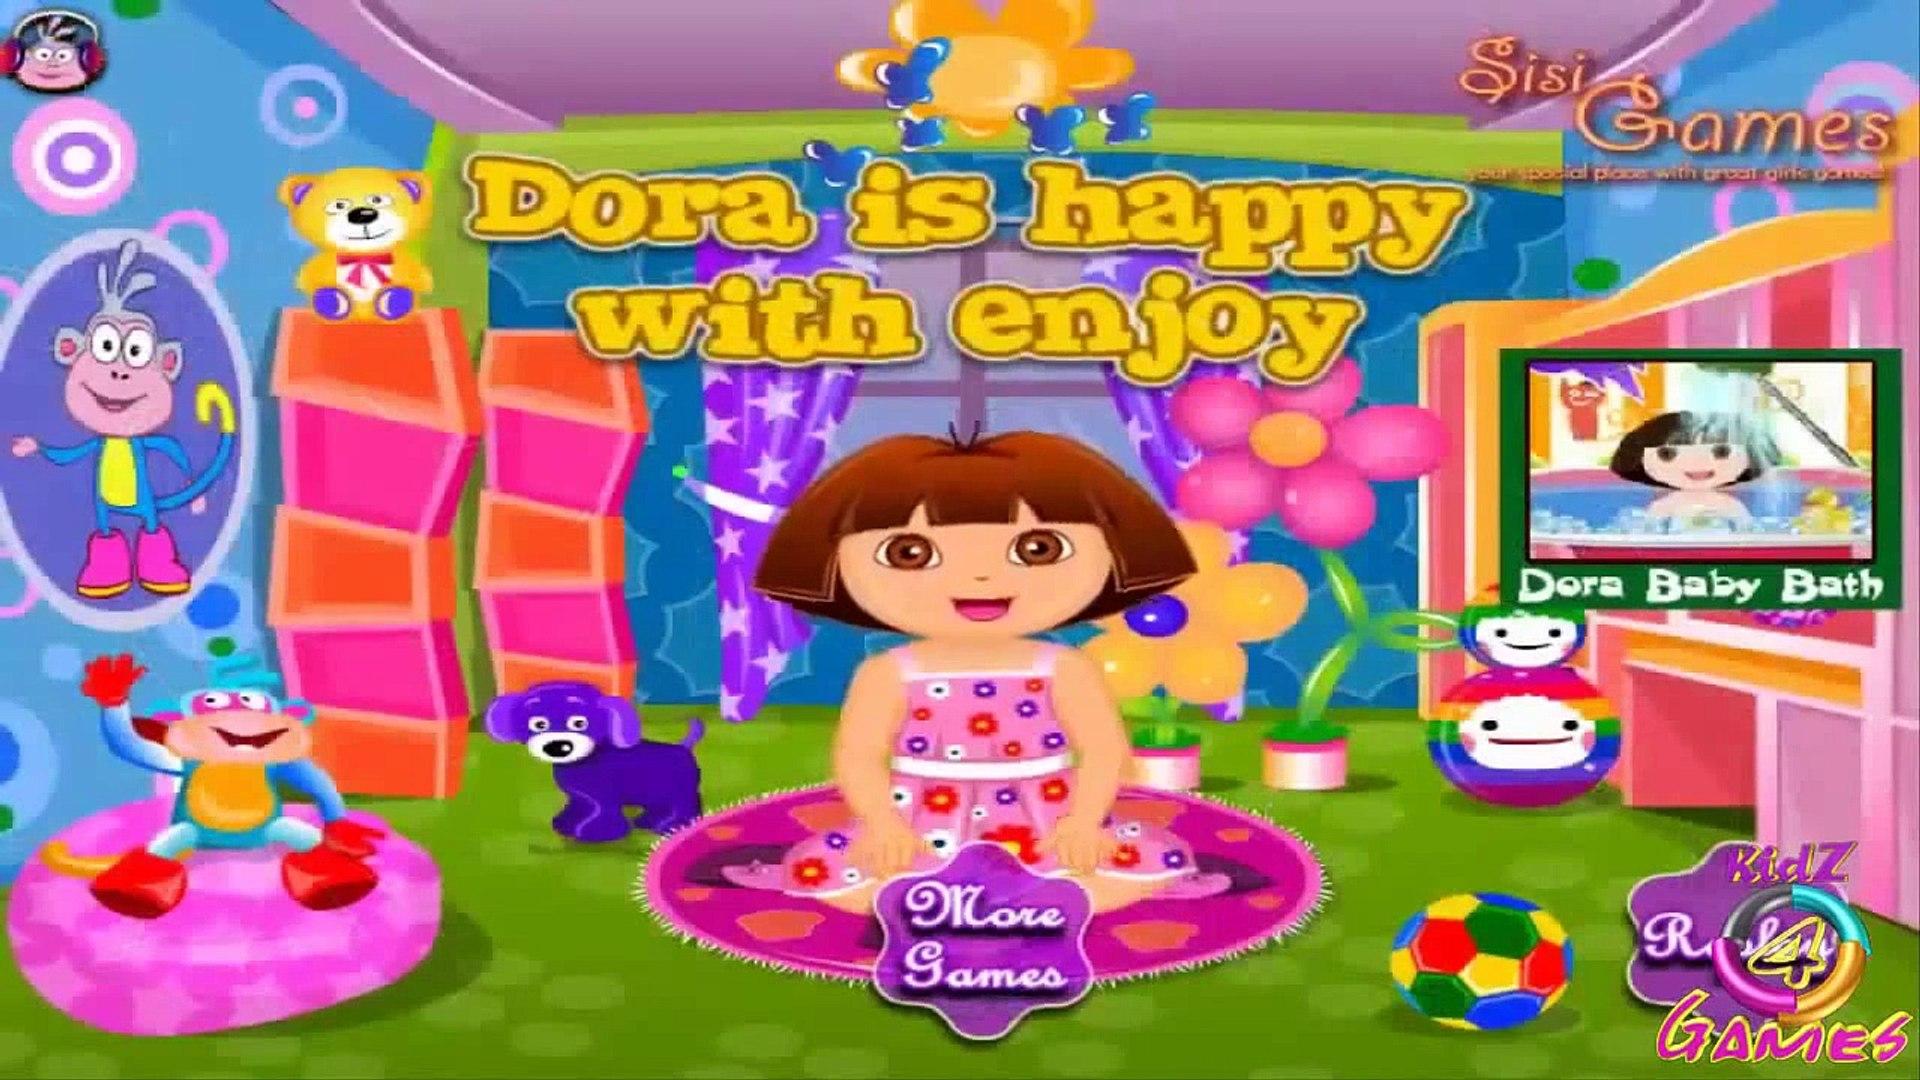 Play Watch # New Dora # the Explorer games cartoons 2014 Edition - Jeux Dora Lexploratrice Anime